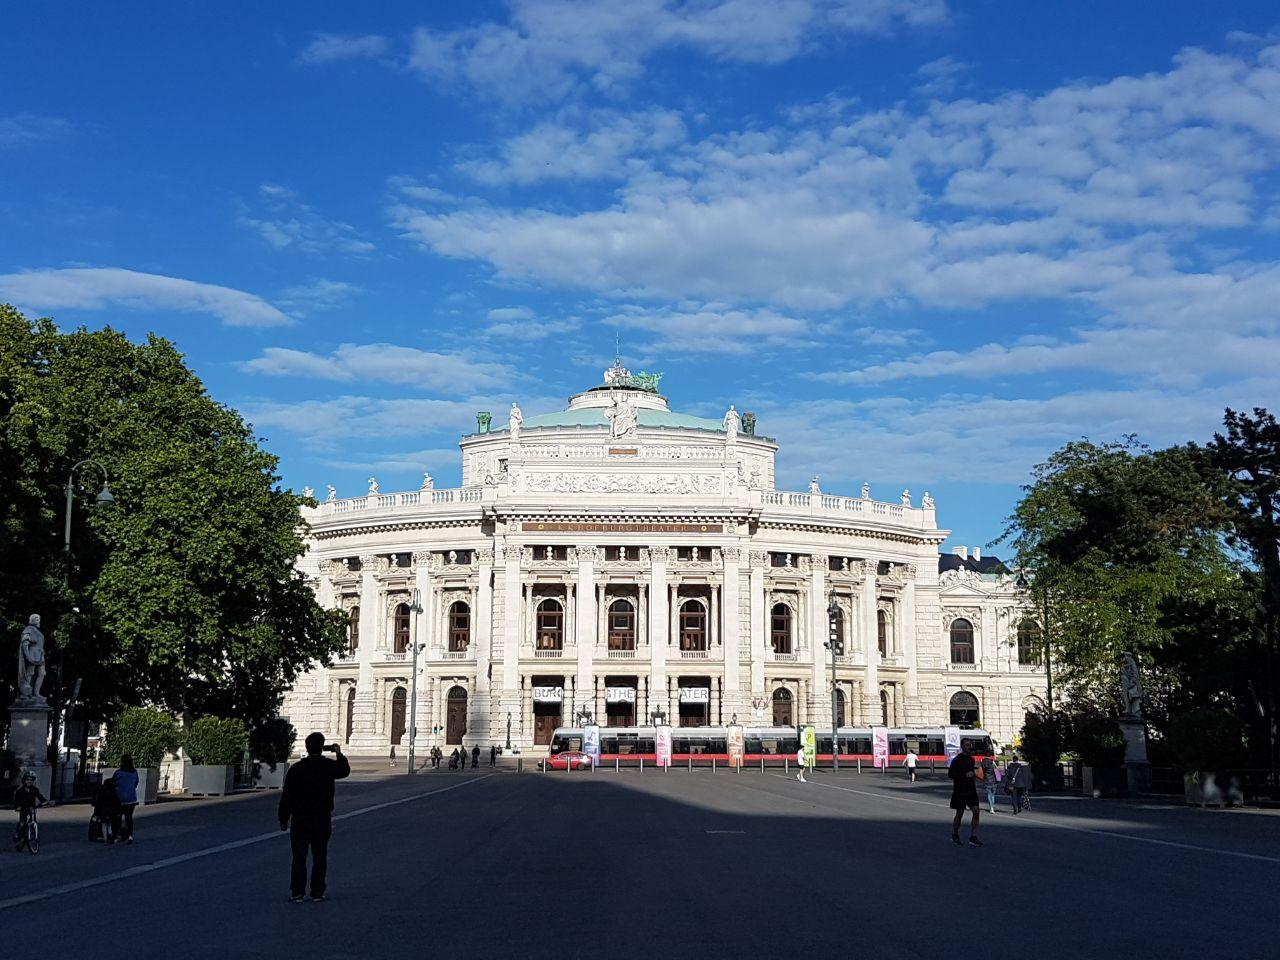 Бургтеатр, Вена, Австрия. Май, 2020